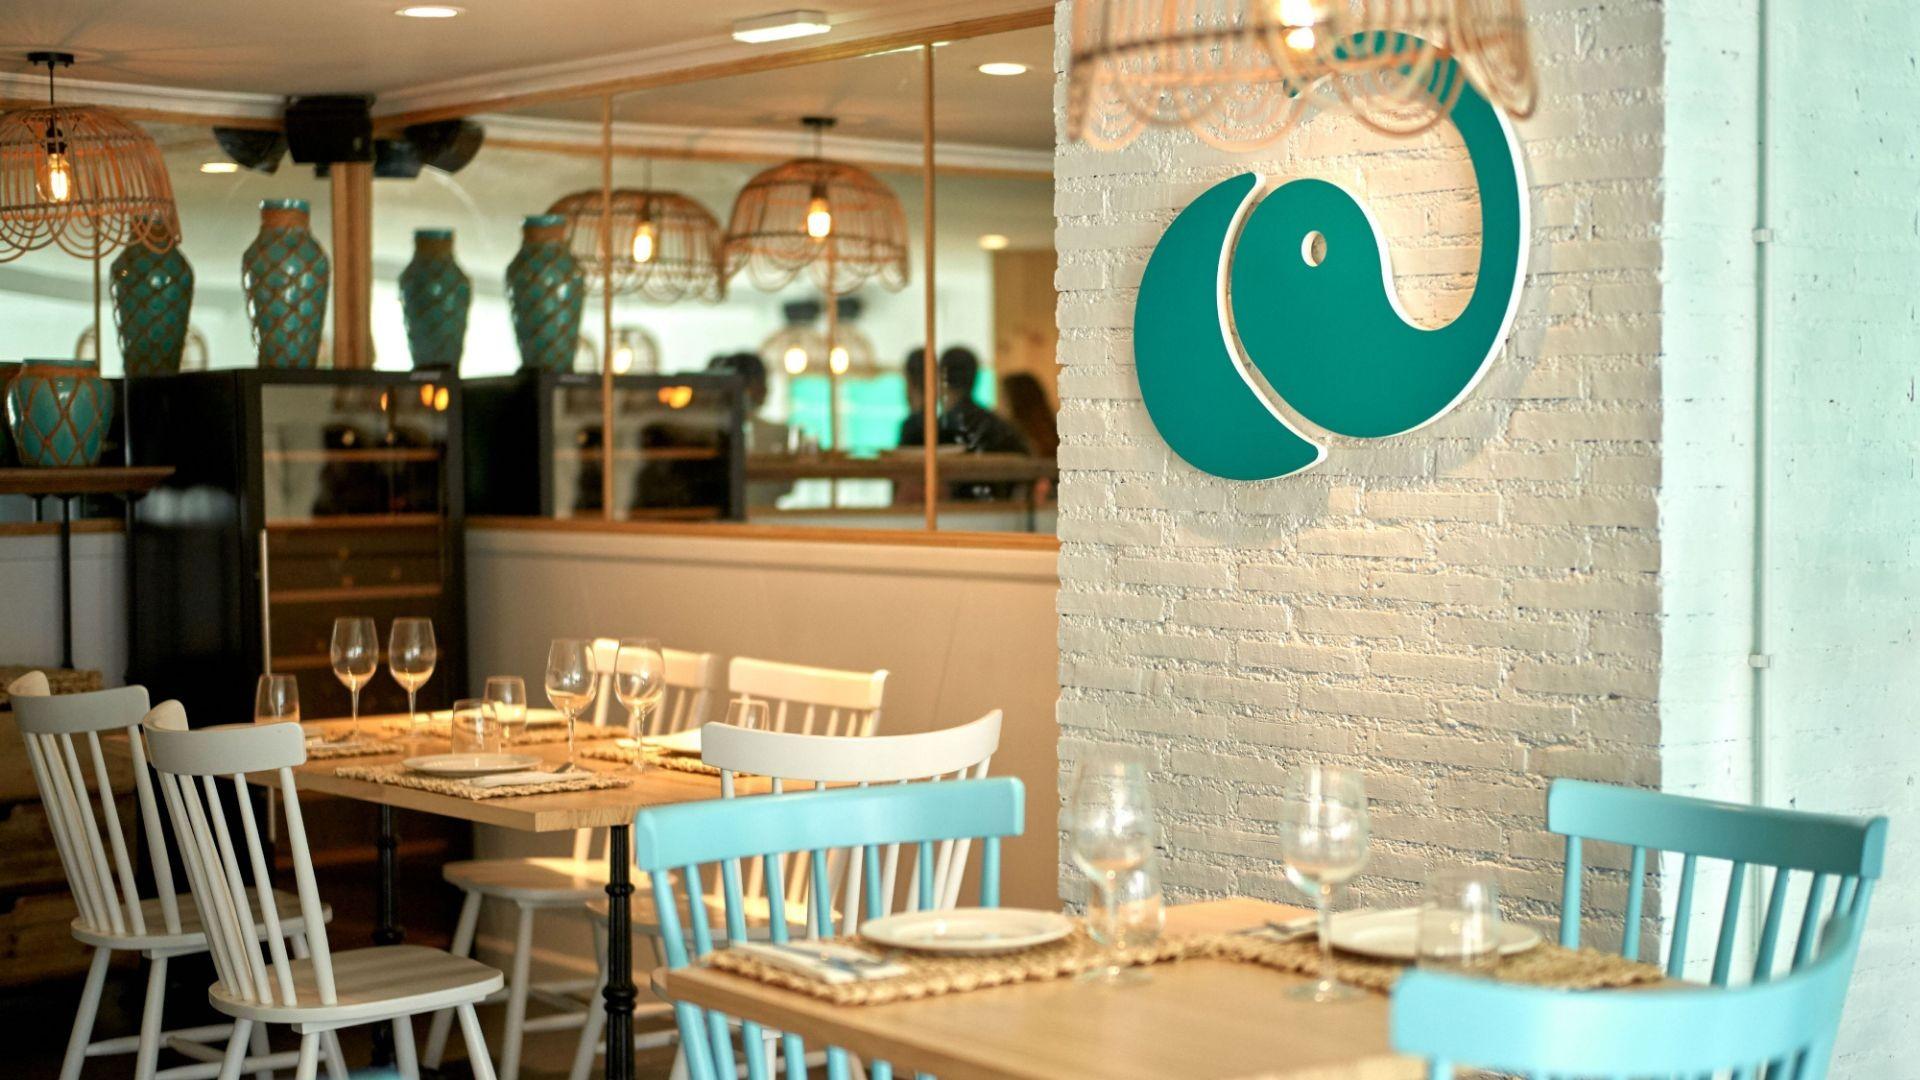 Restaurante asturiano Gijón